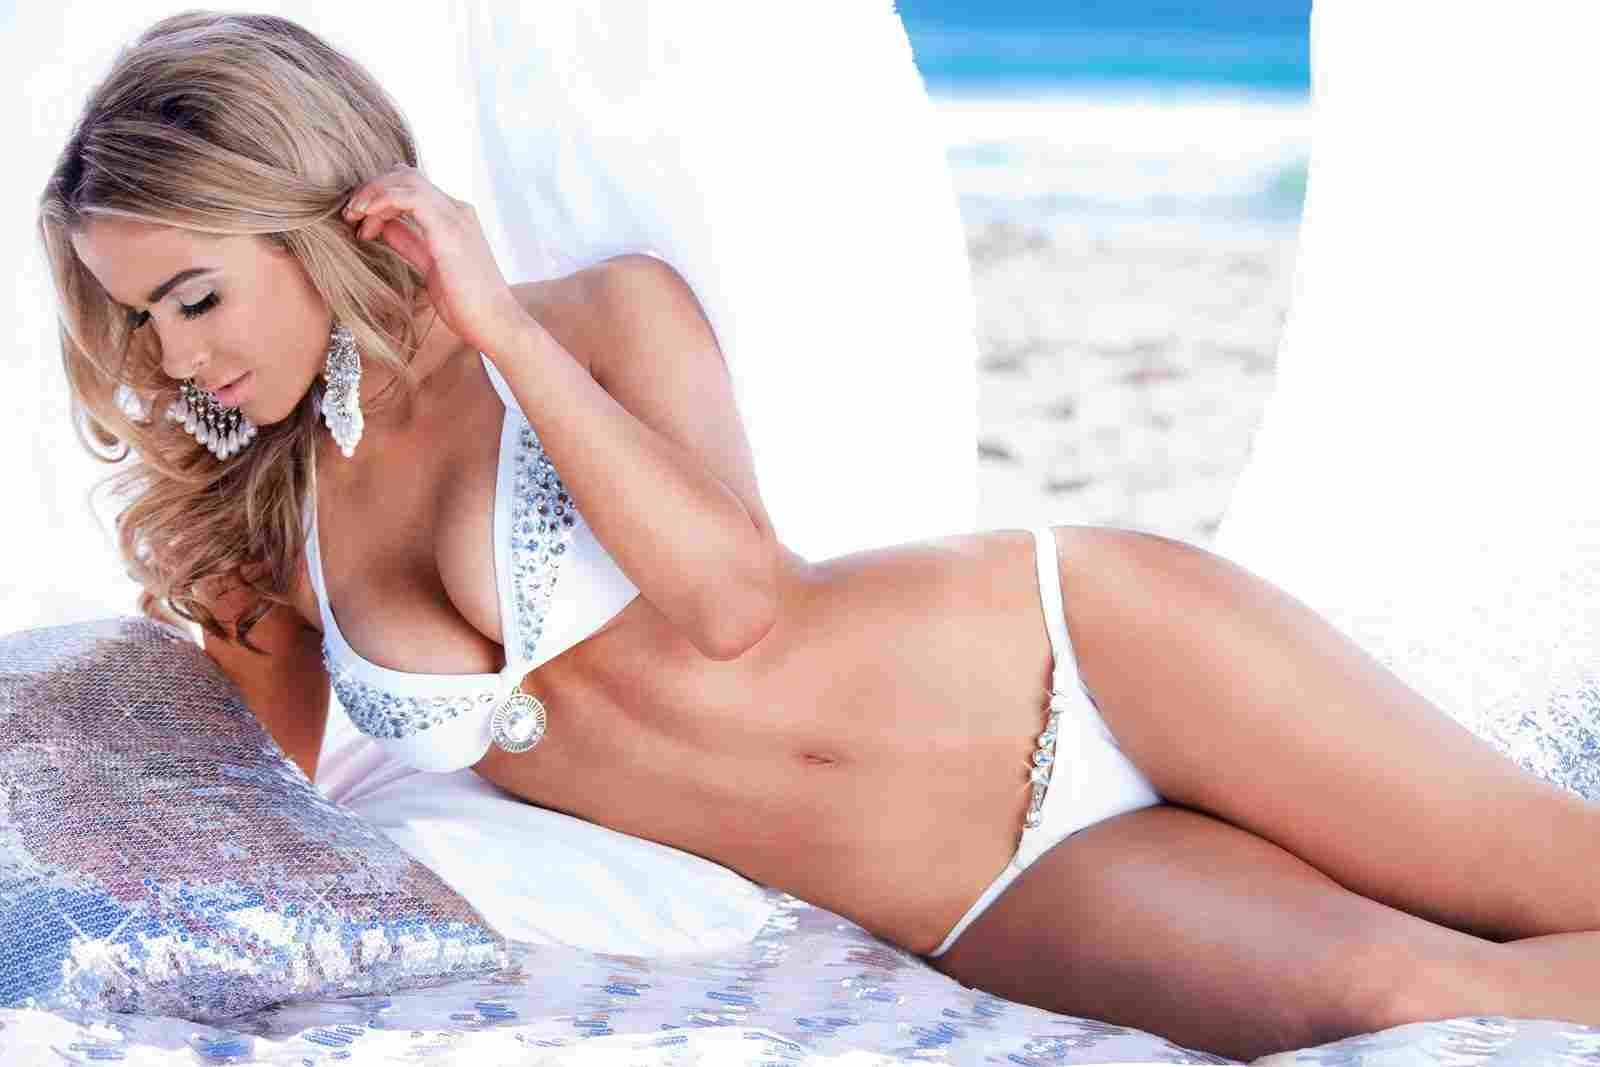 Leaked Ellie Gonsalves nudes (64 photo), Sideboobs